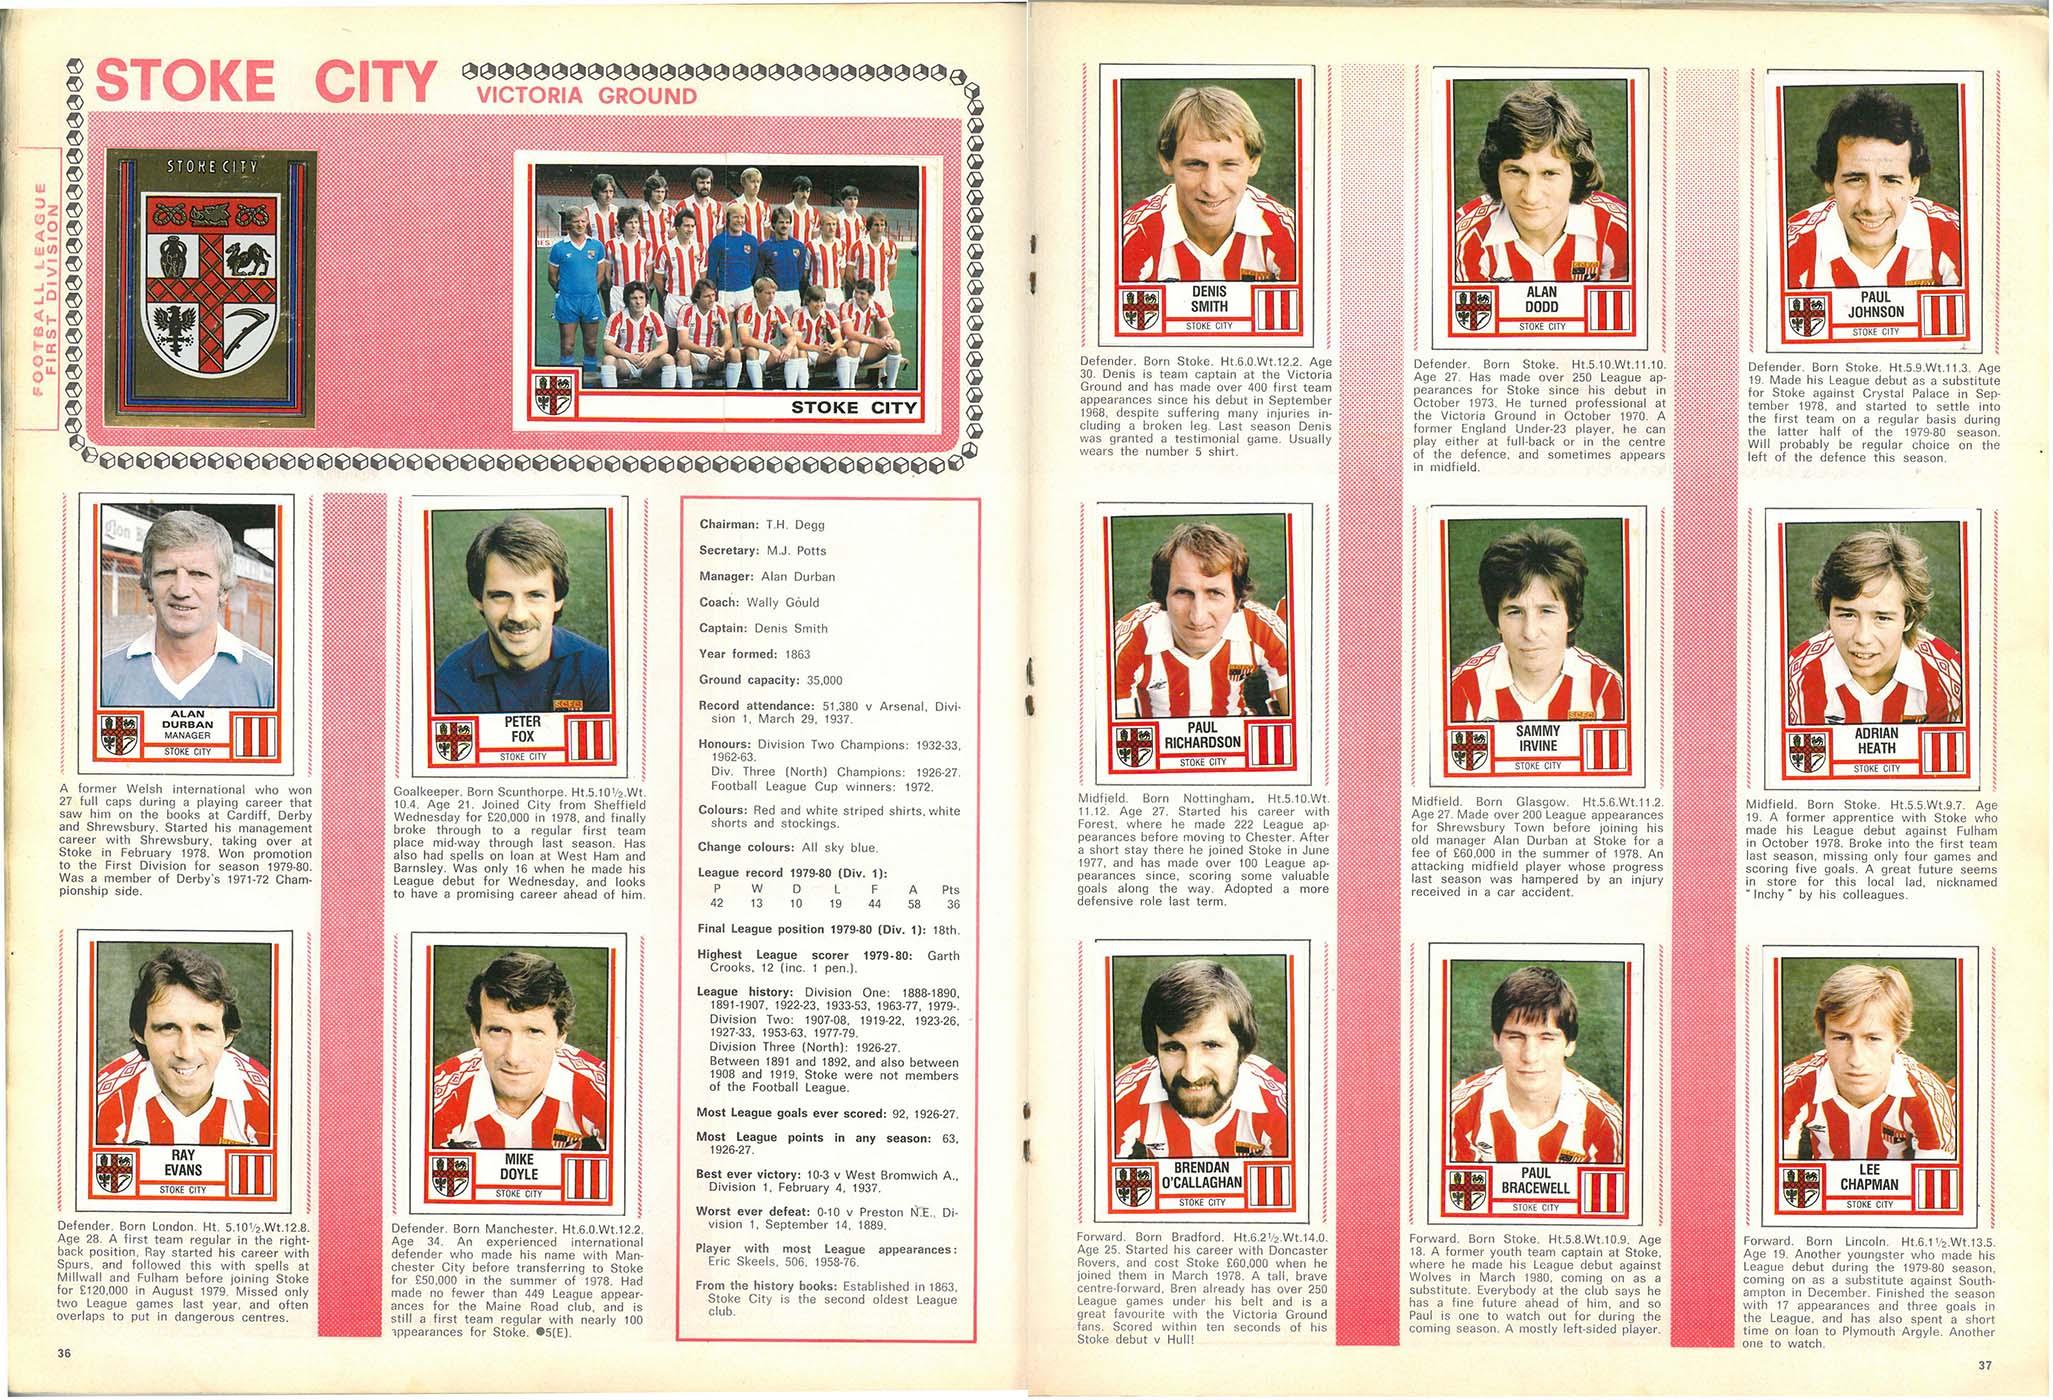 Stoke City 1981